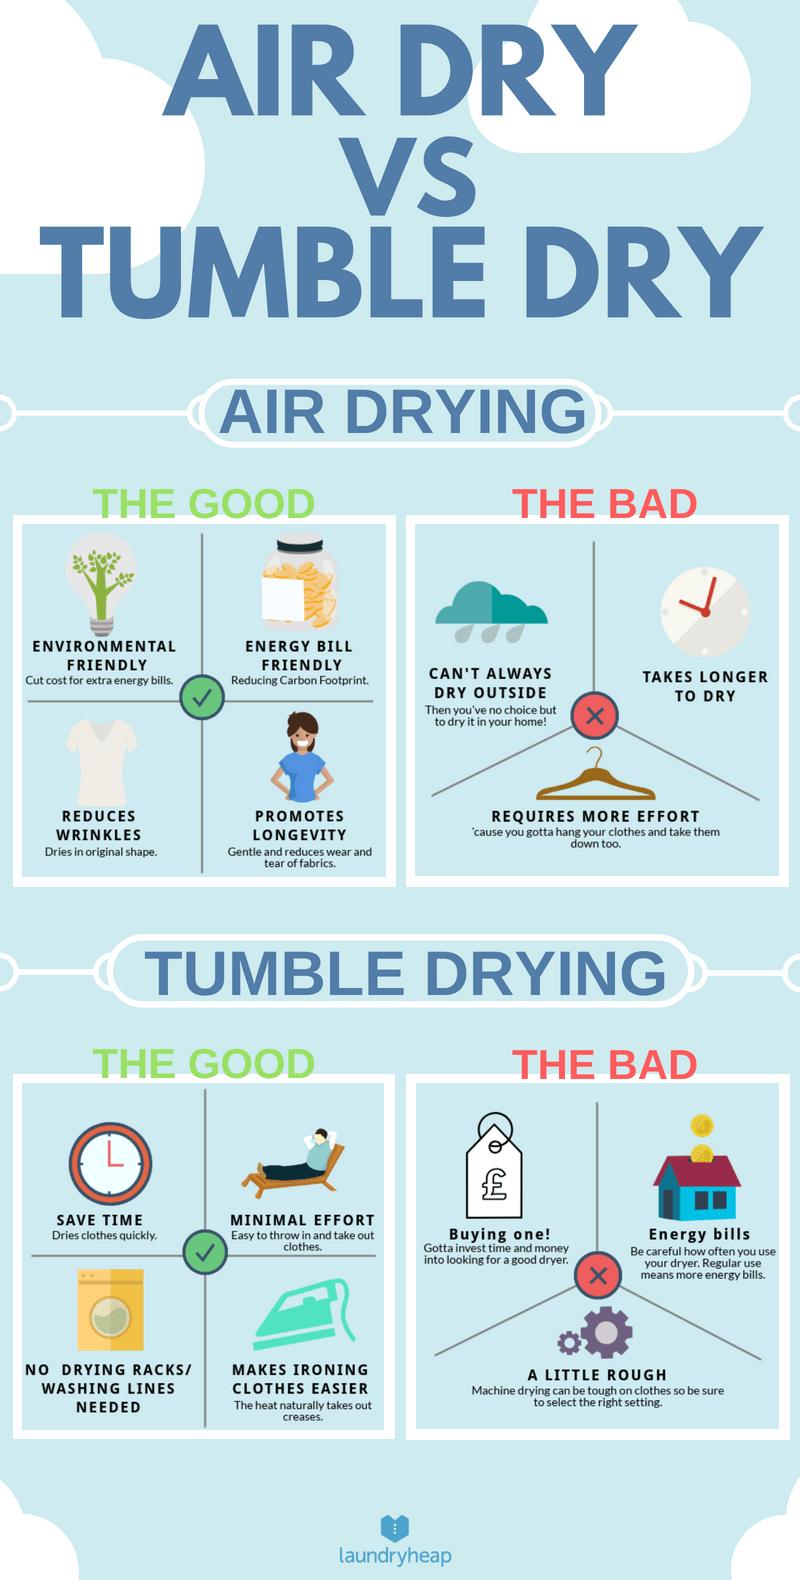 Air dry vs tumble dry infographic